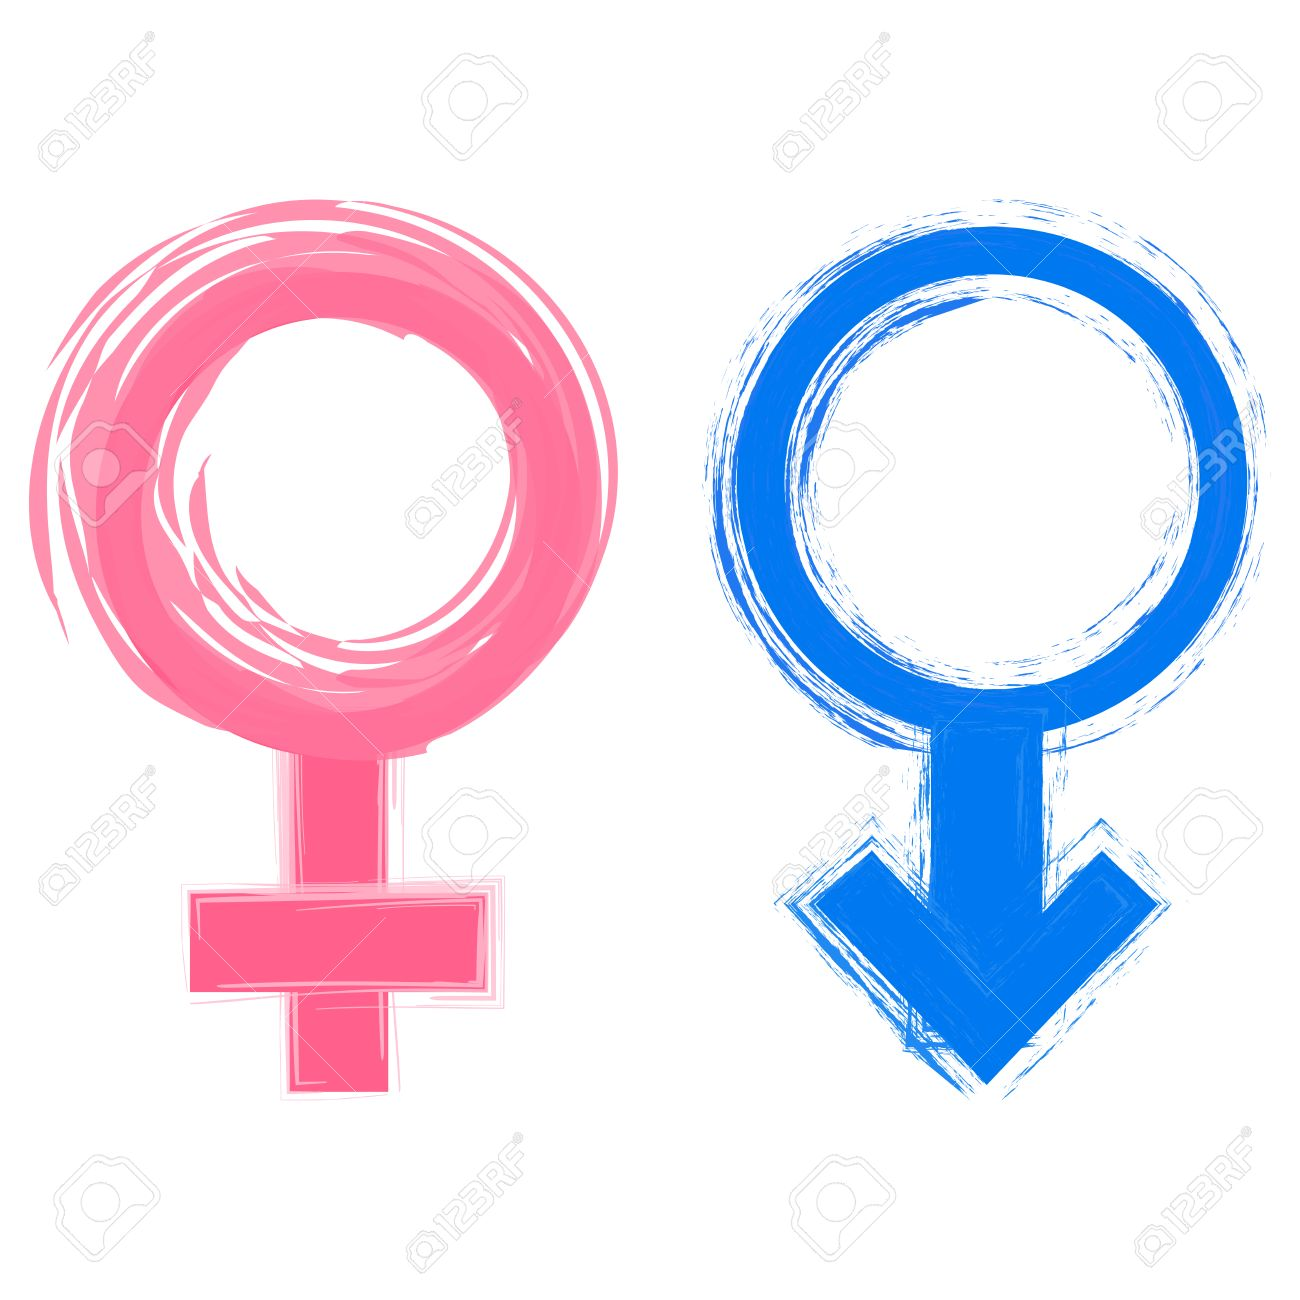 Vector illustration of male and female gender symbols.